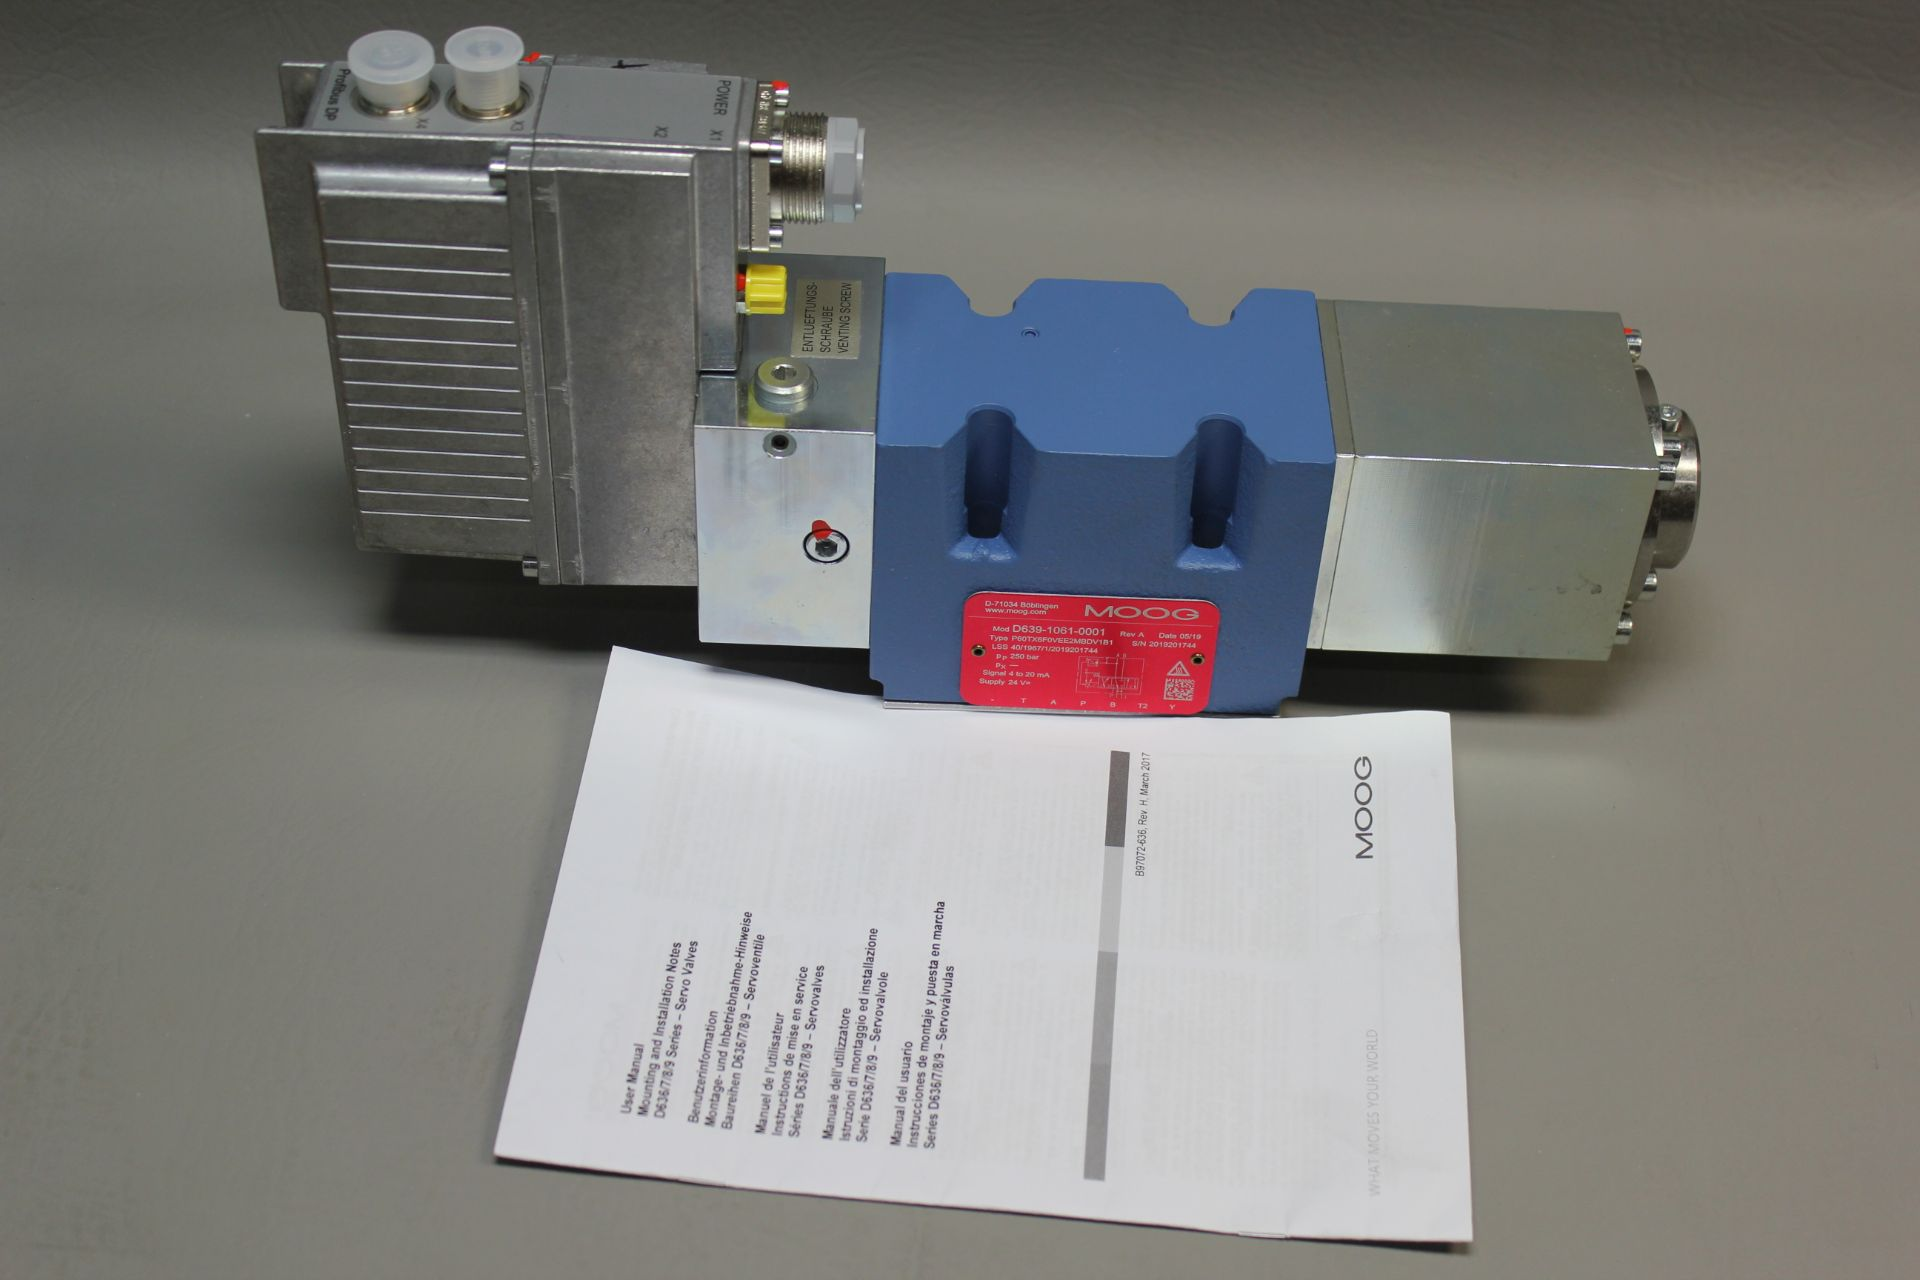 NEW MOOG DIRECT DRIVE DIGITAL CONTROL HYDRAULIC SERVO VALVE - Image 4 of 15